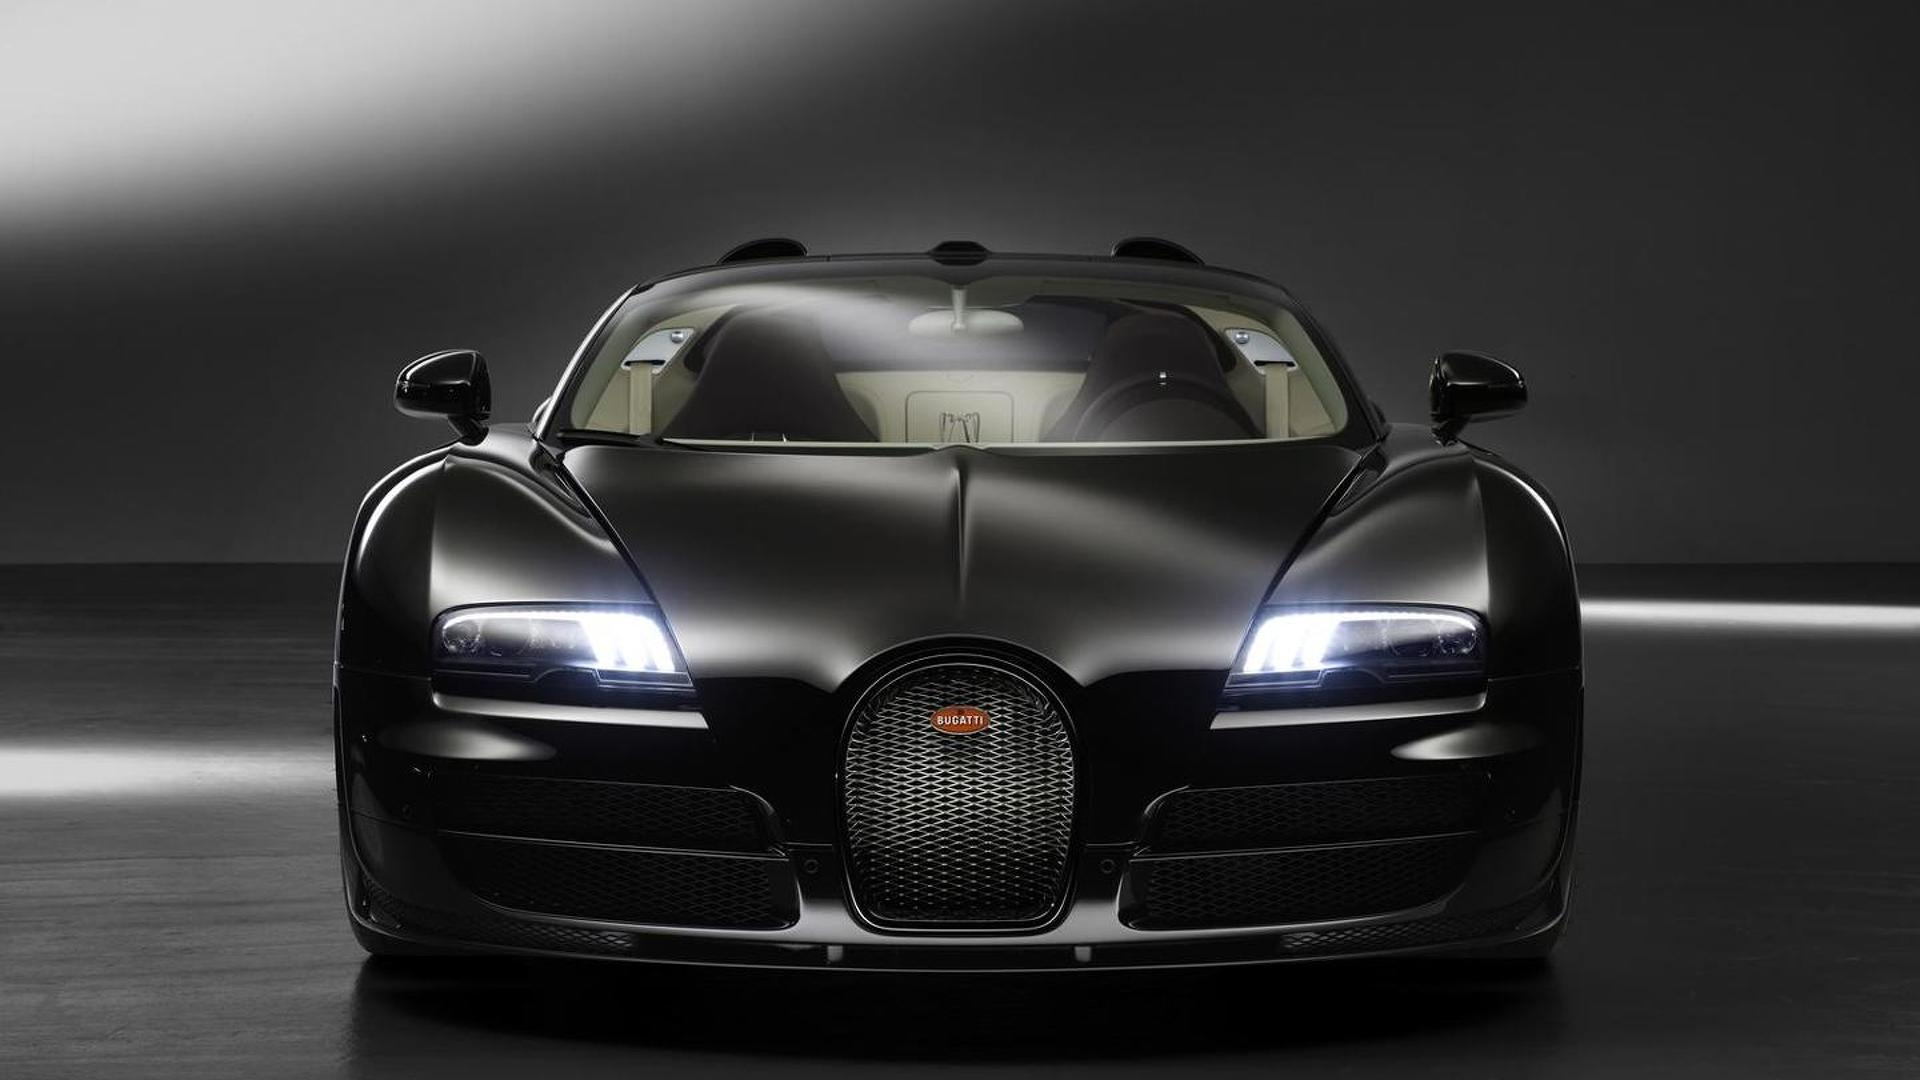 2013-409124-bugatti-veyron-grand-sport-vitesse-jean-bugatti-special-edition-09-09-20131 Inspiring Bugatti Veyron Quarter Mile Speed Cars Trend